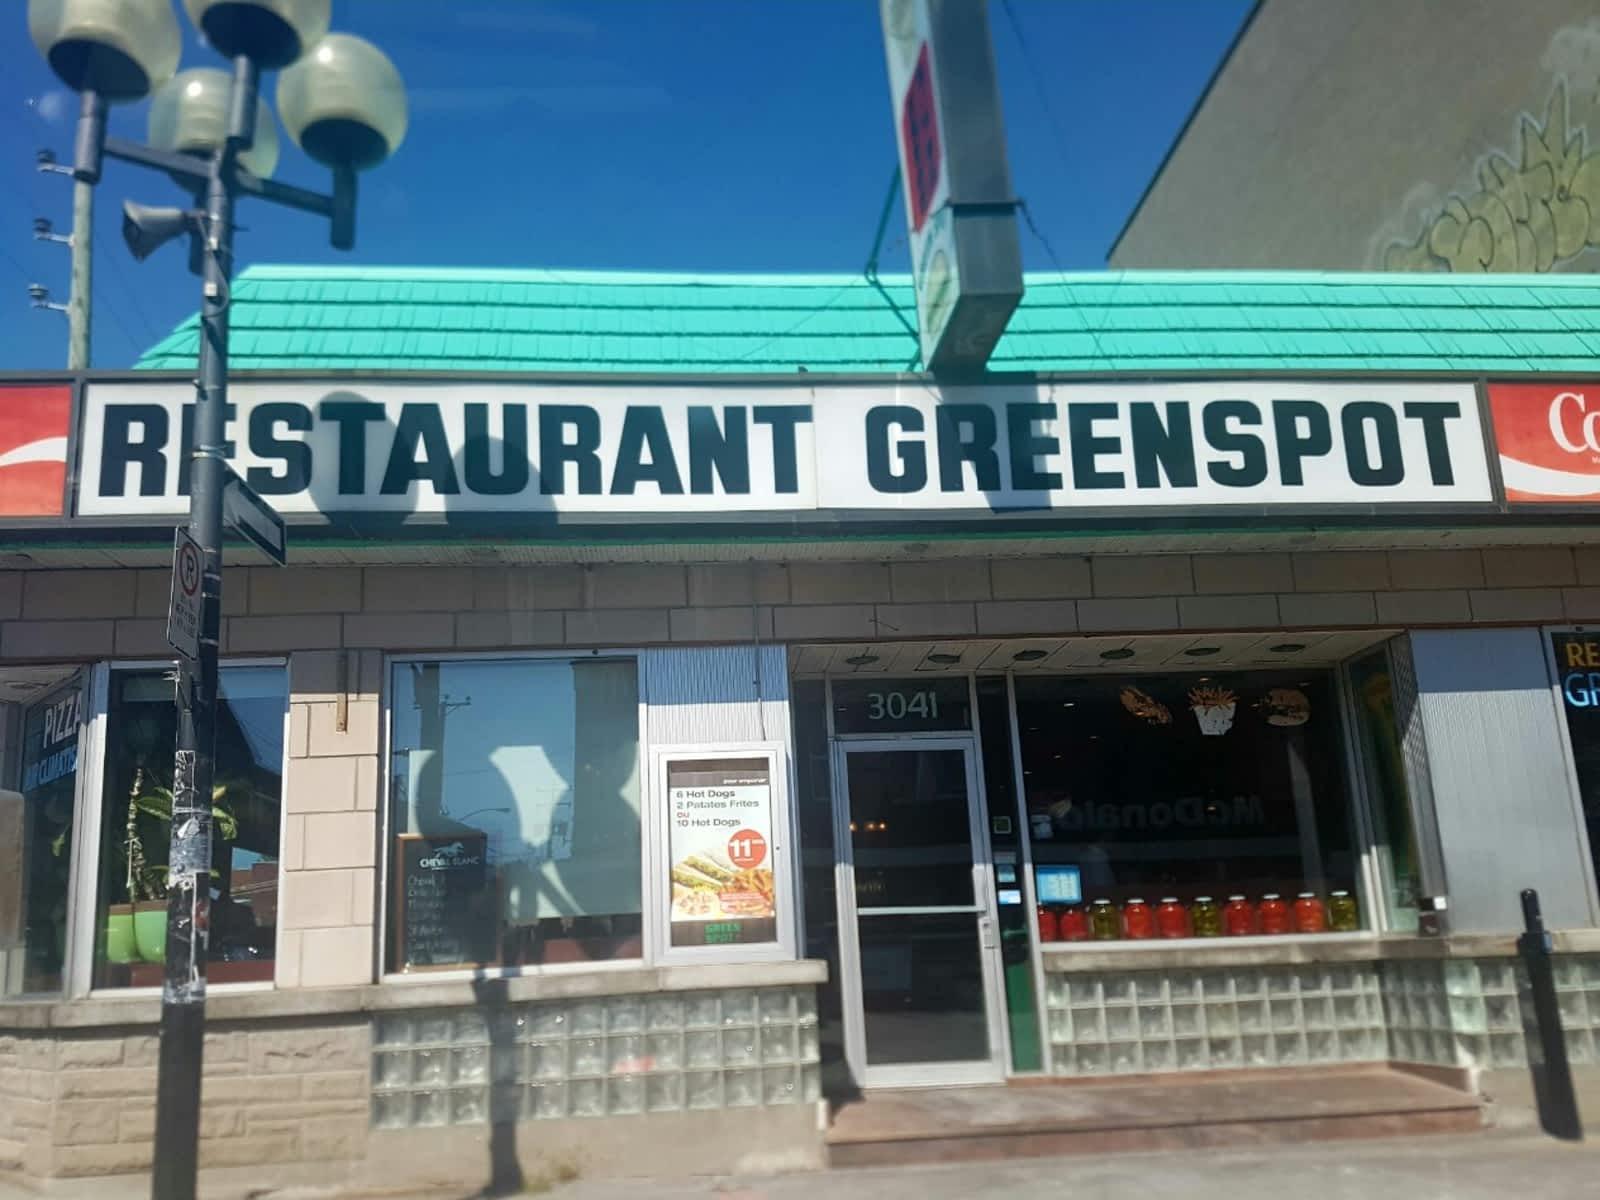 greenspot-restaurant-devanture-2.jpg